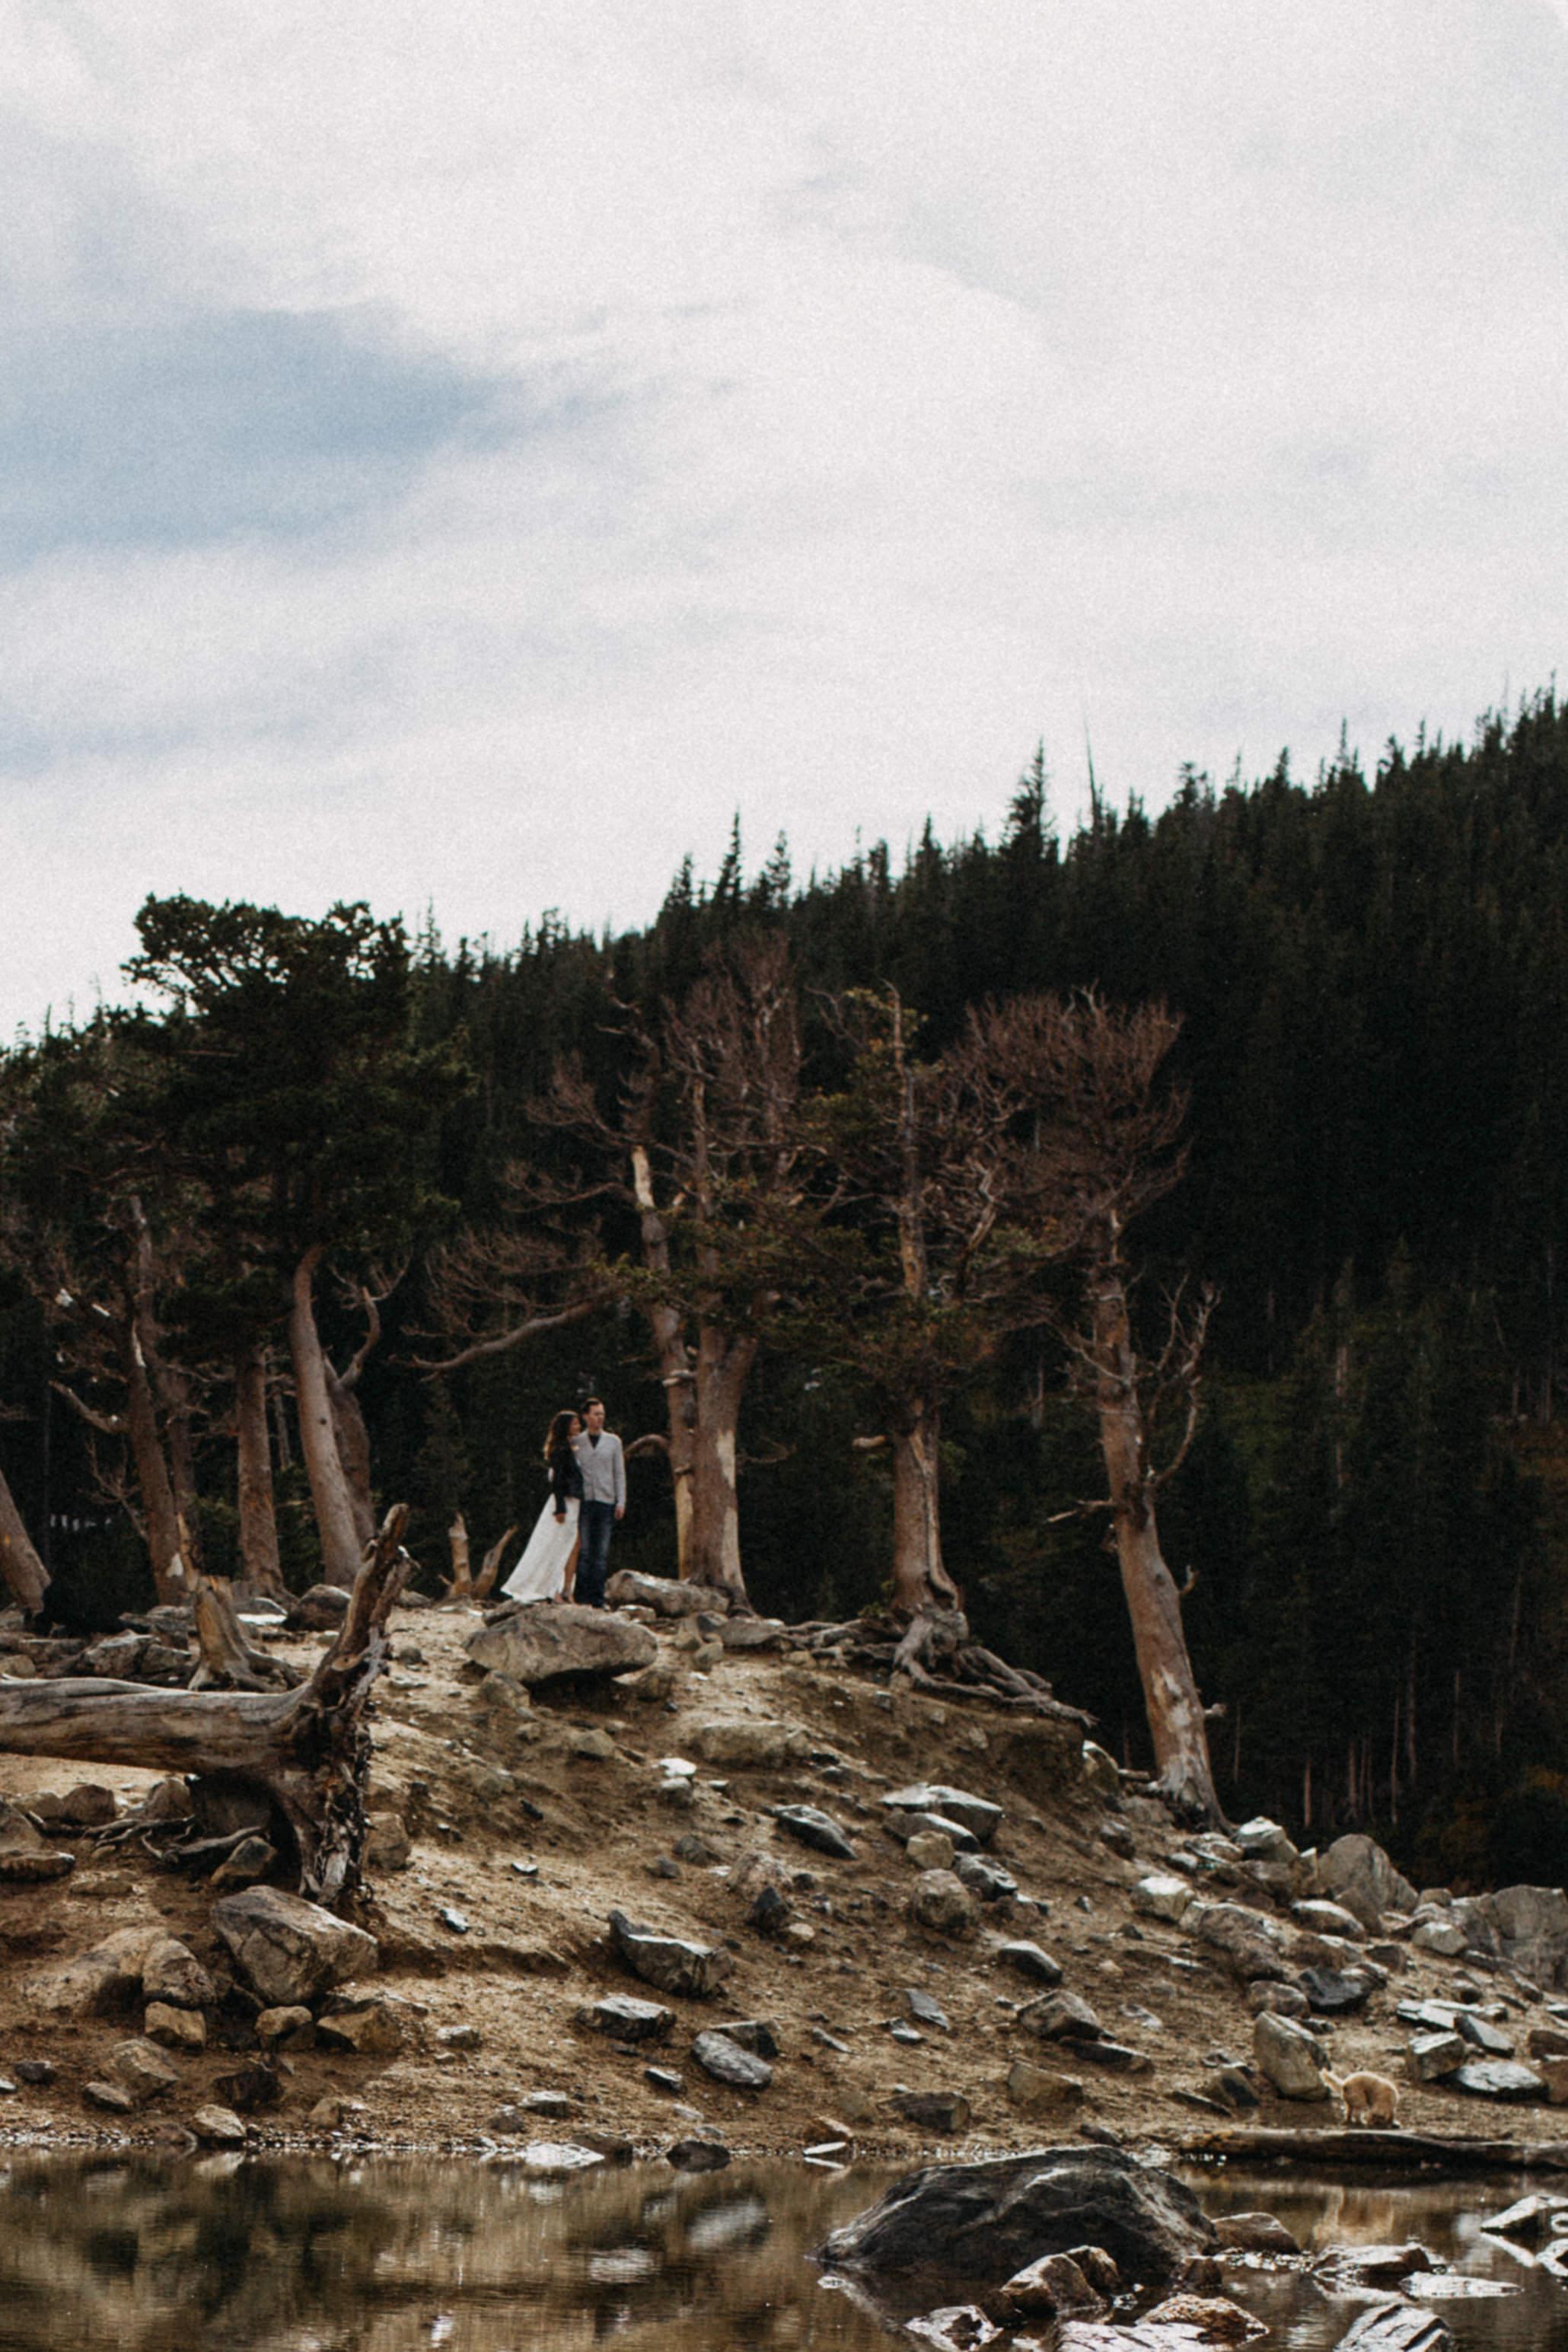 Destination Elopement Photography in Denver, Colorado